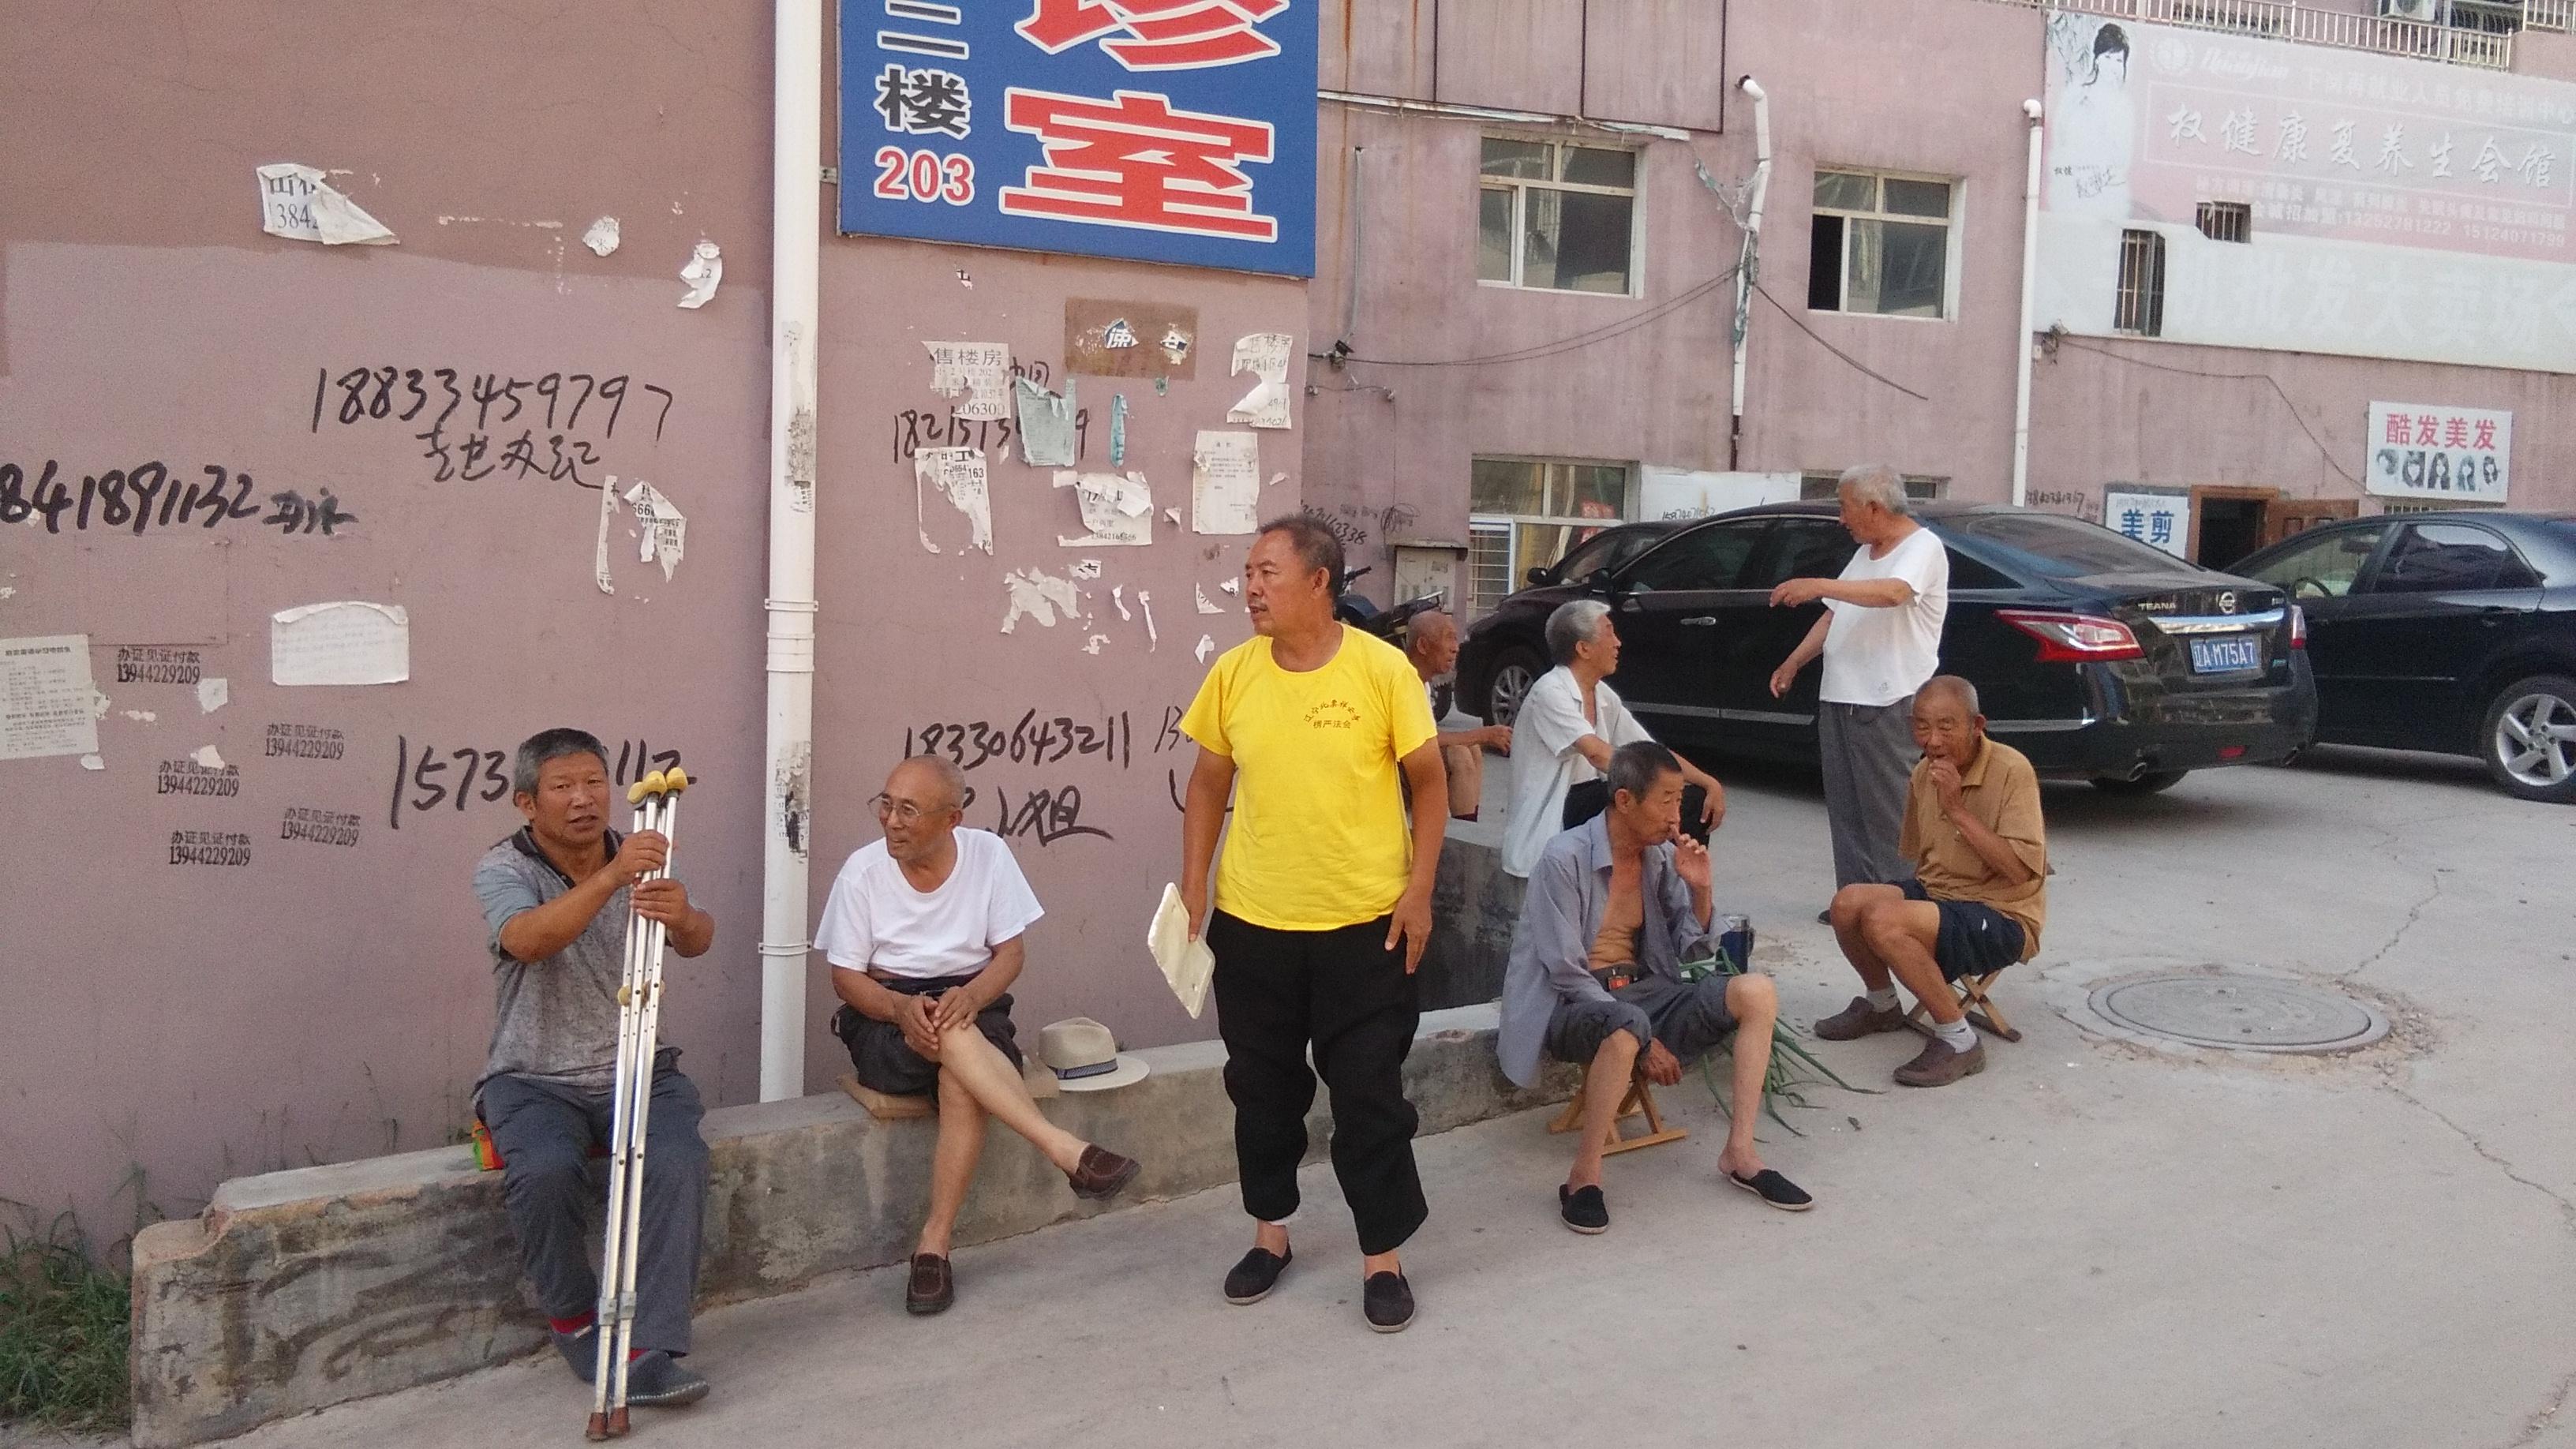 Peoplw on the street - Beipiao